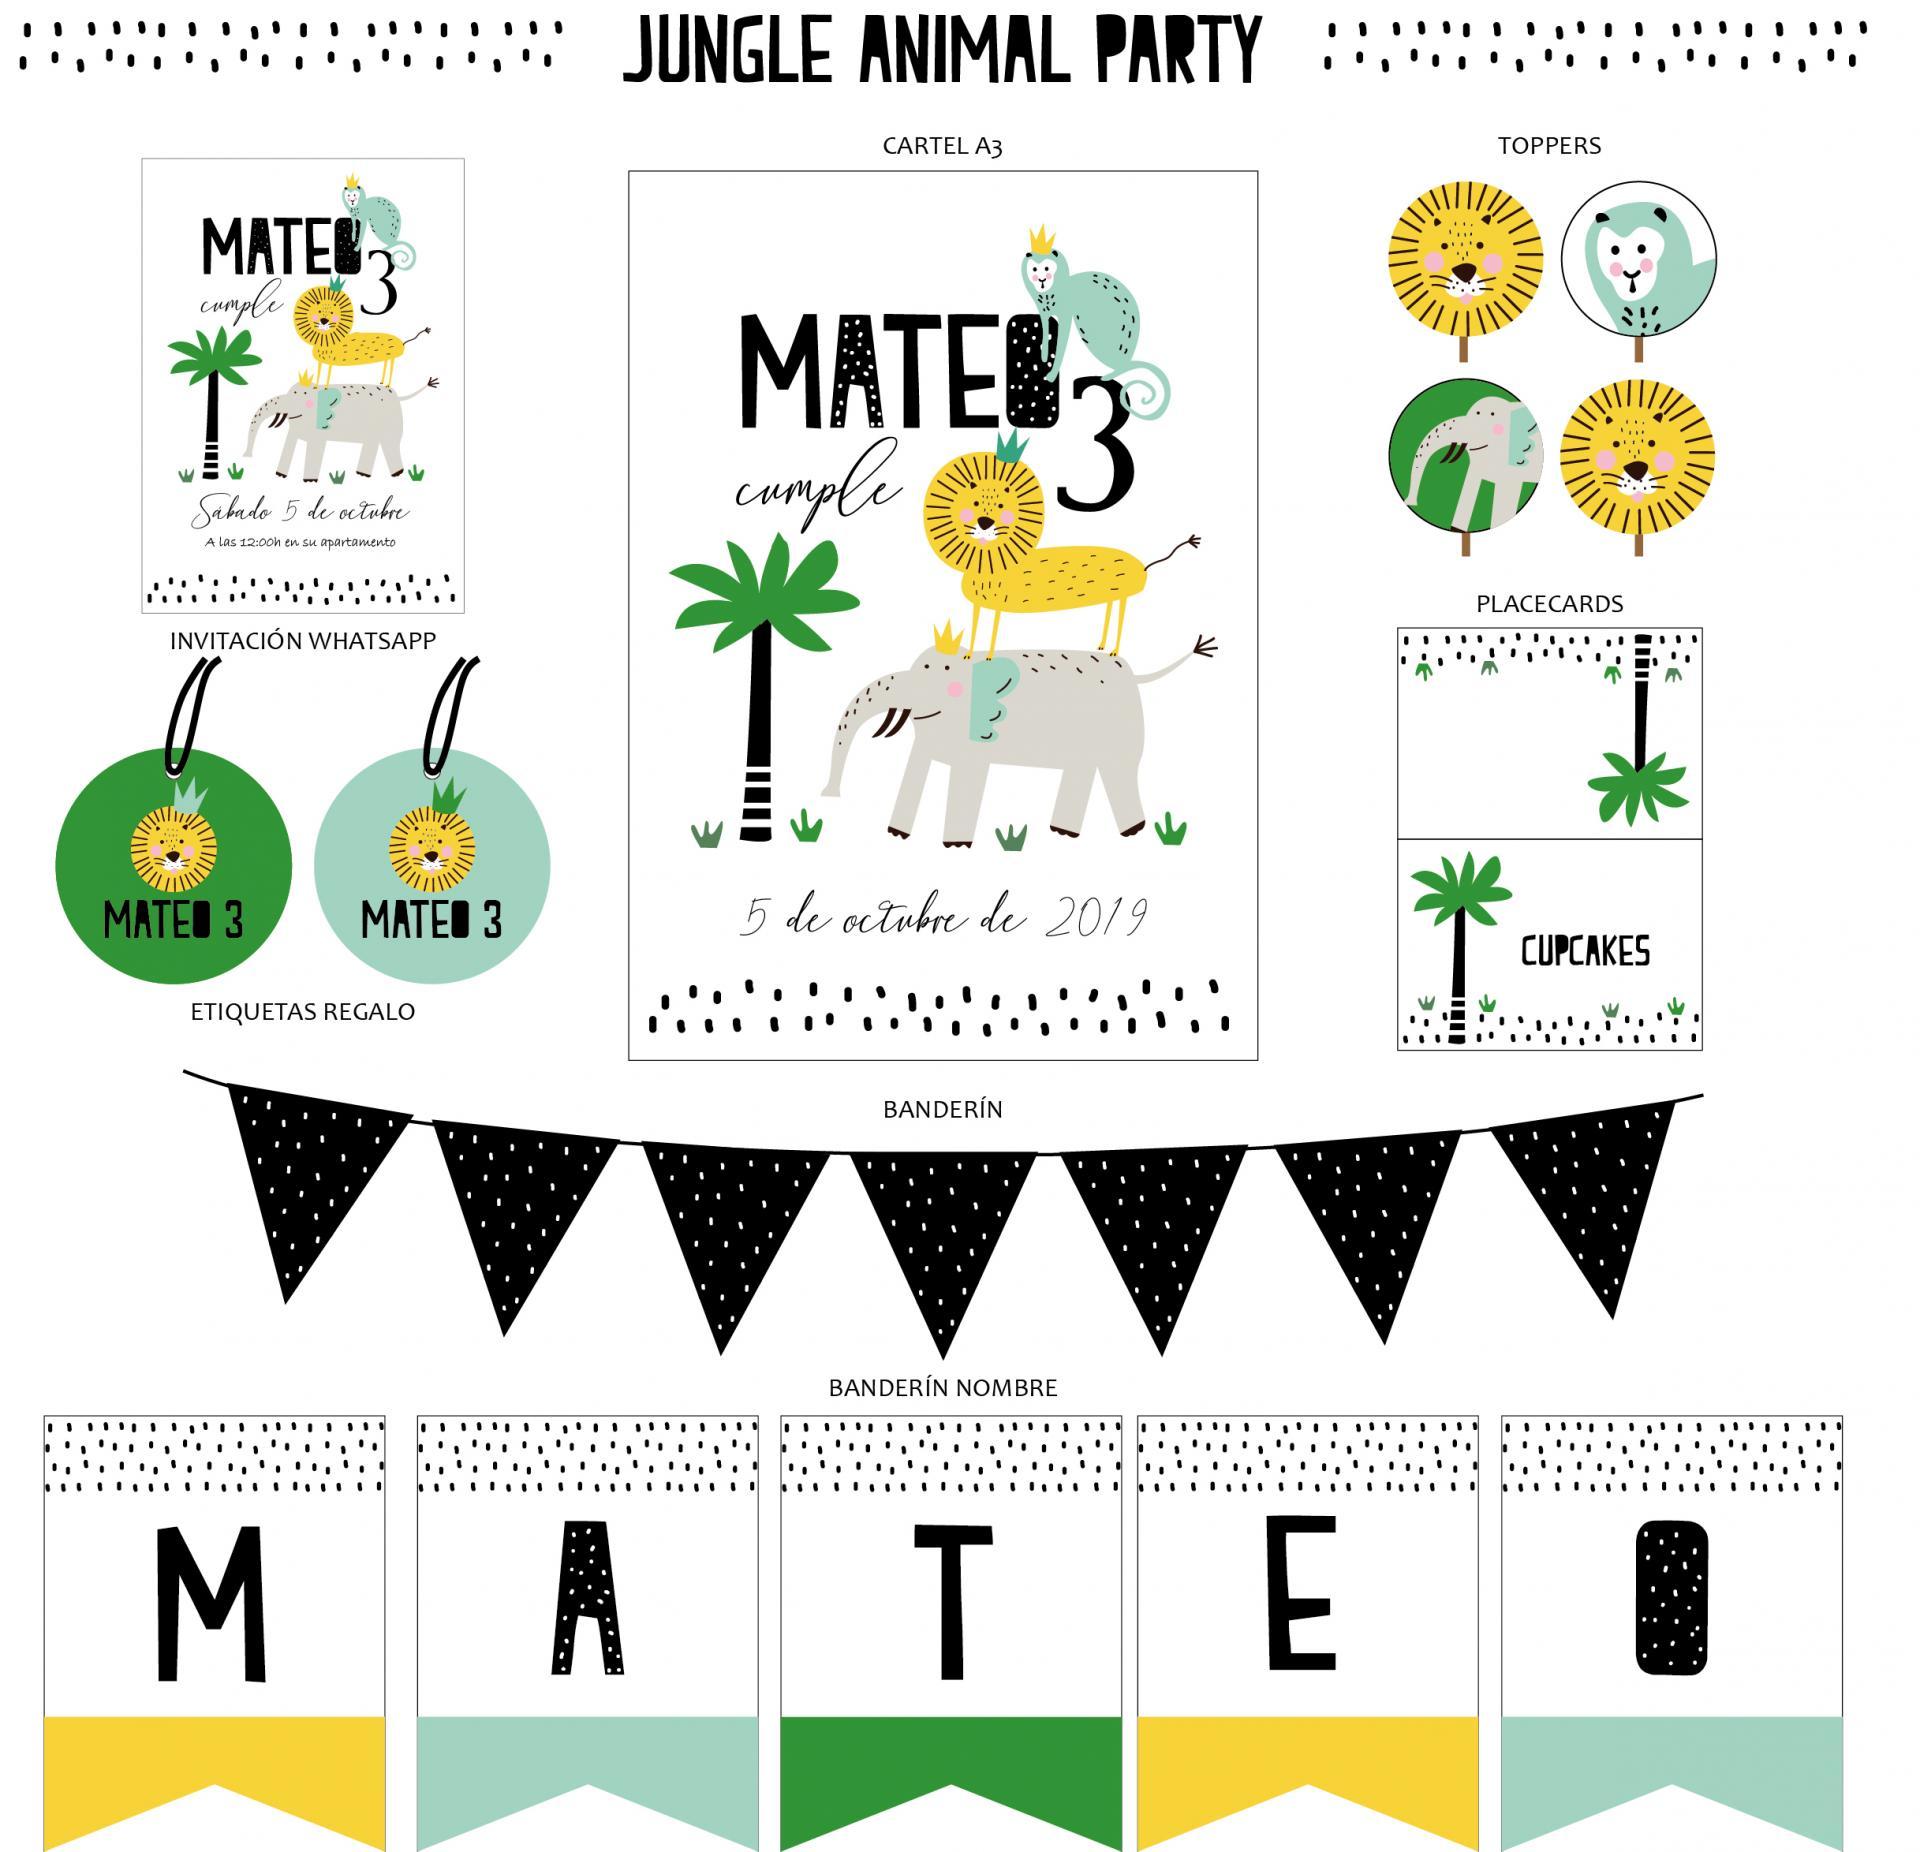 KIT JUNGLE ANIMAL PARTY IMPRESO